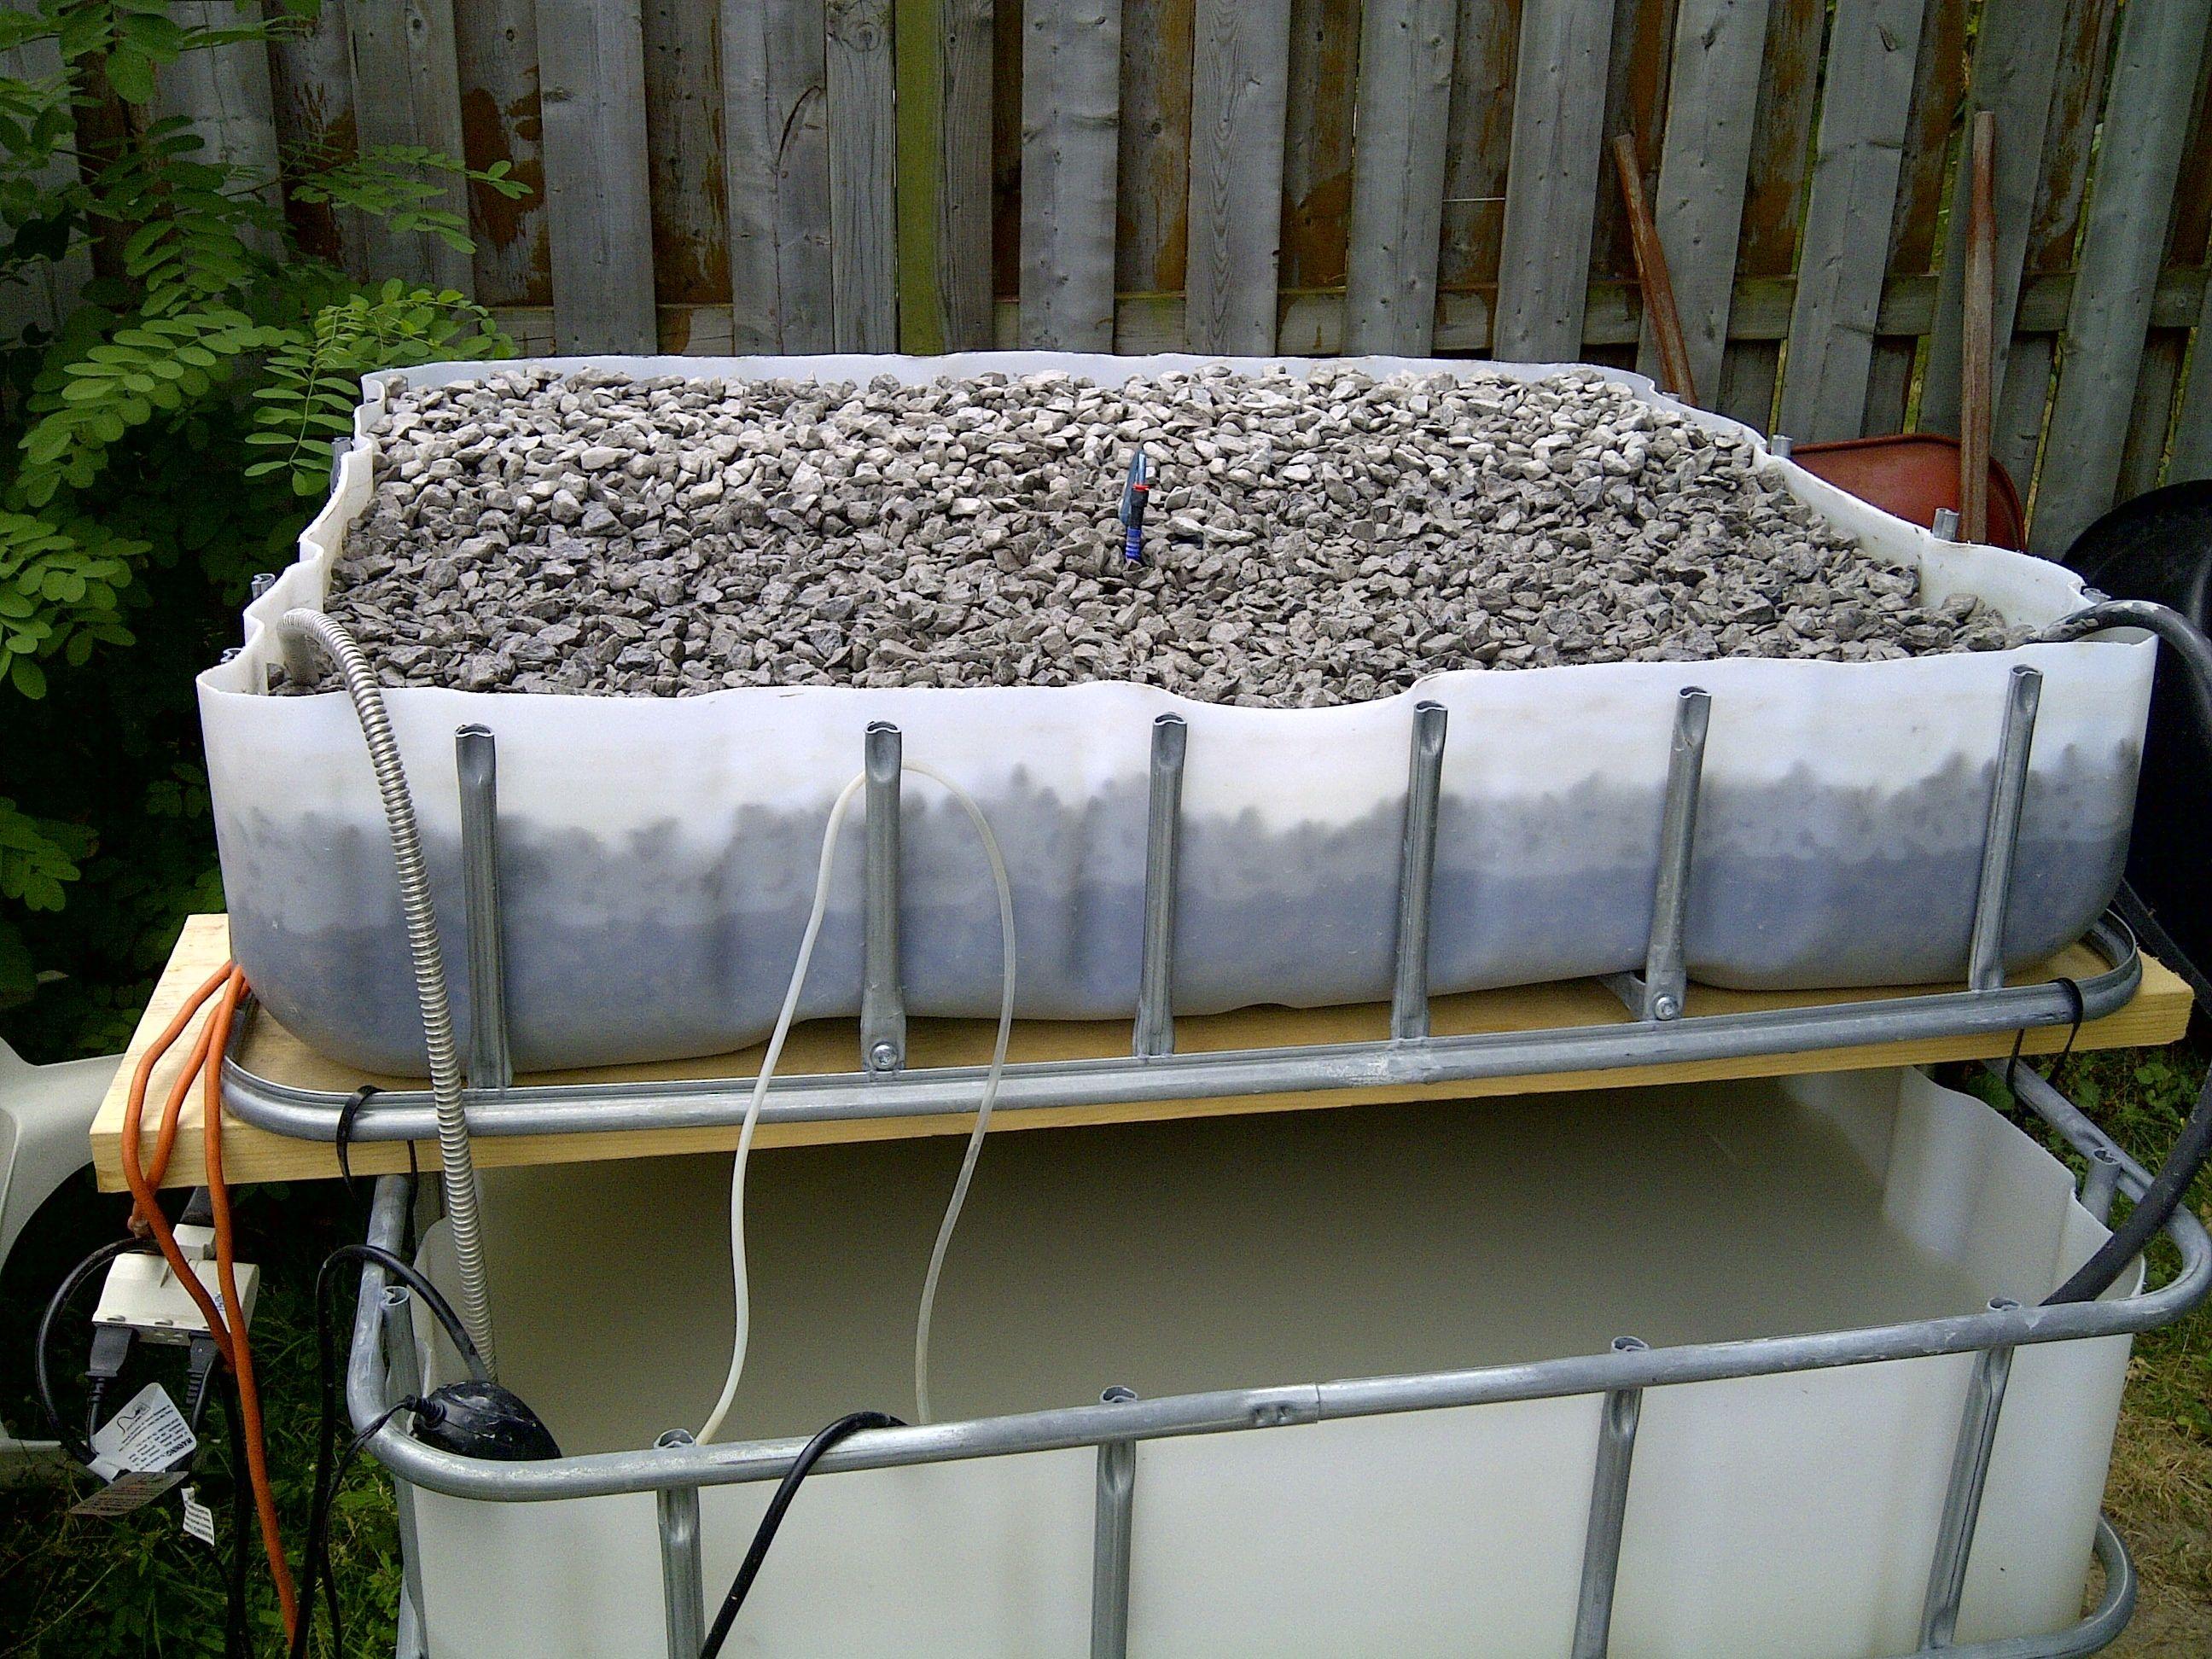 Aquaponics grow beds for Aquaponics grow bed